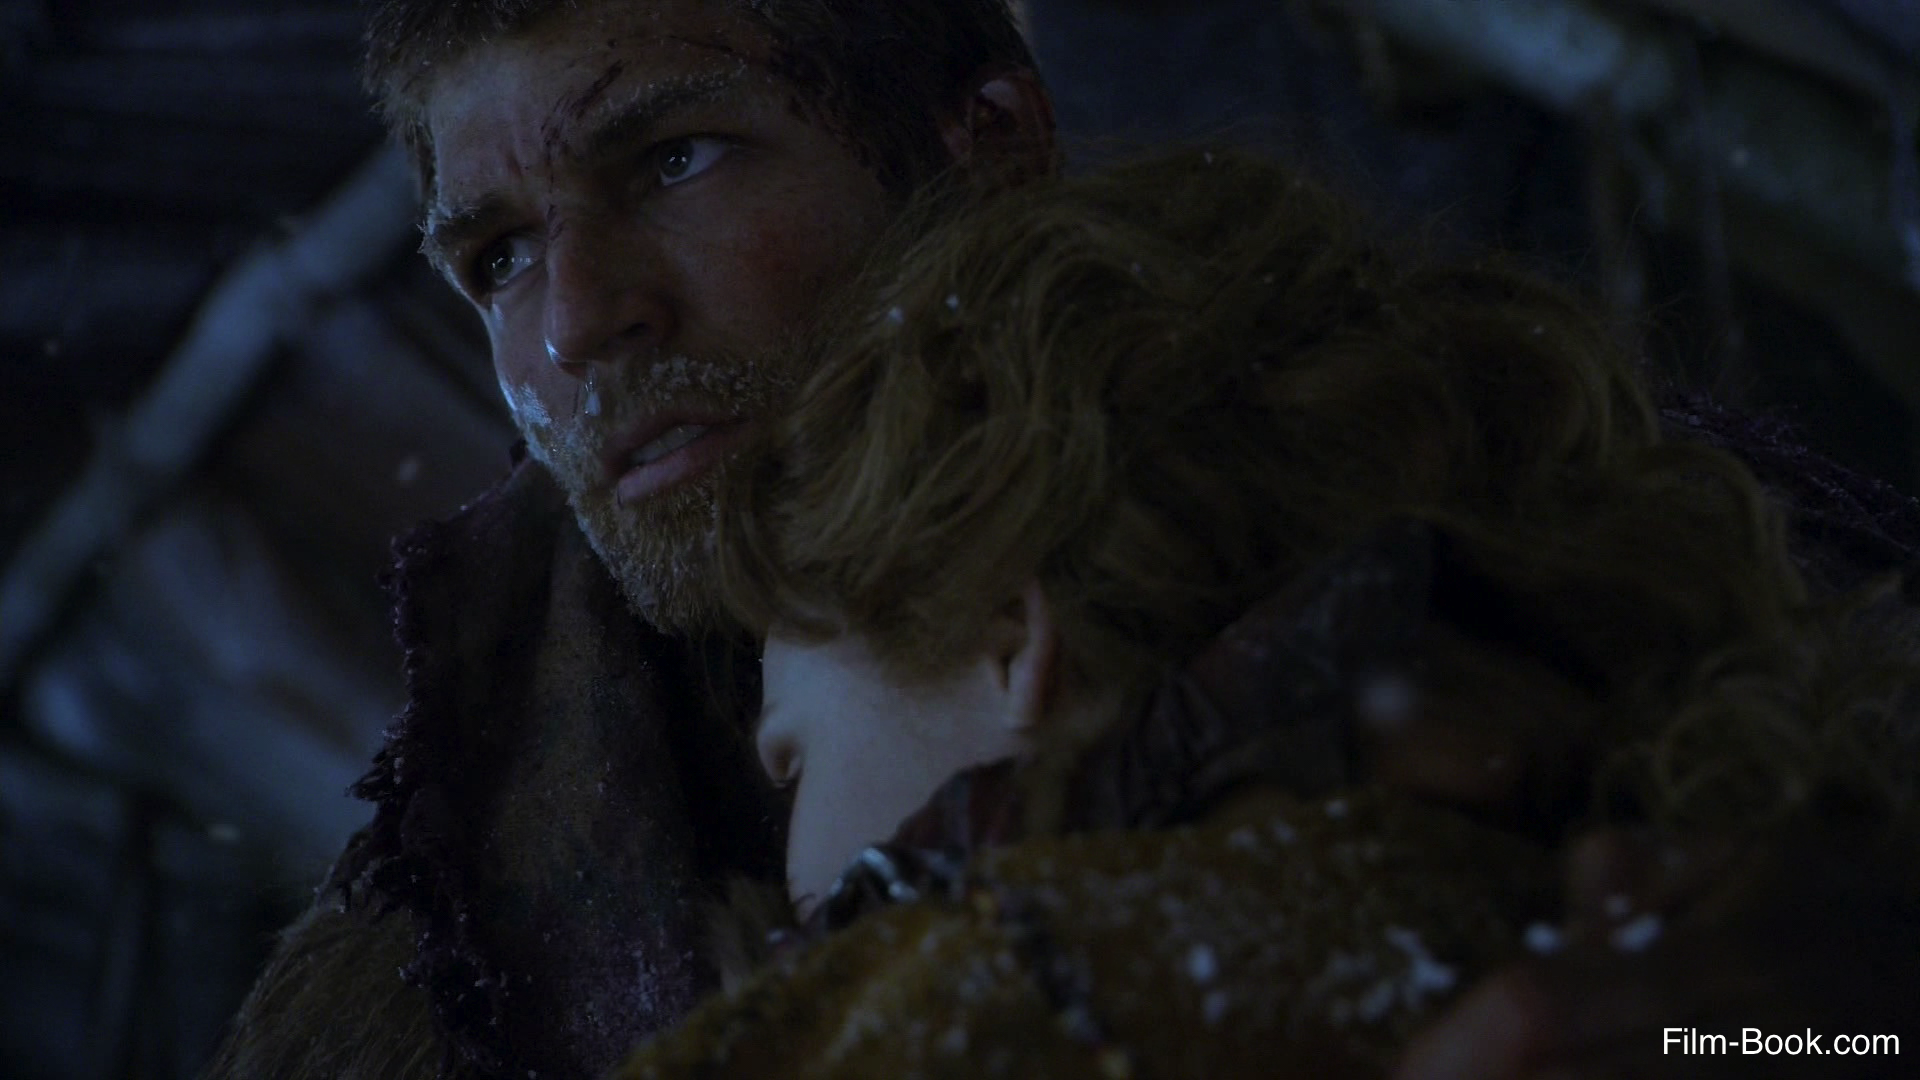 Liam McIntyre Anna Hutchison Spartacus War of the Damned Mors Indecepta